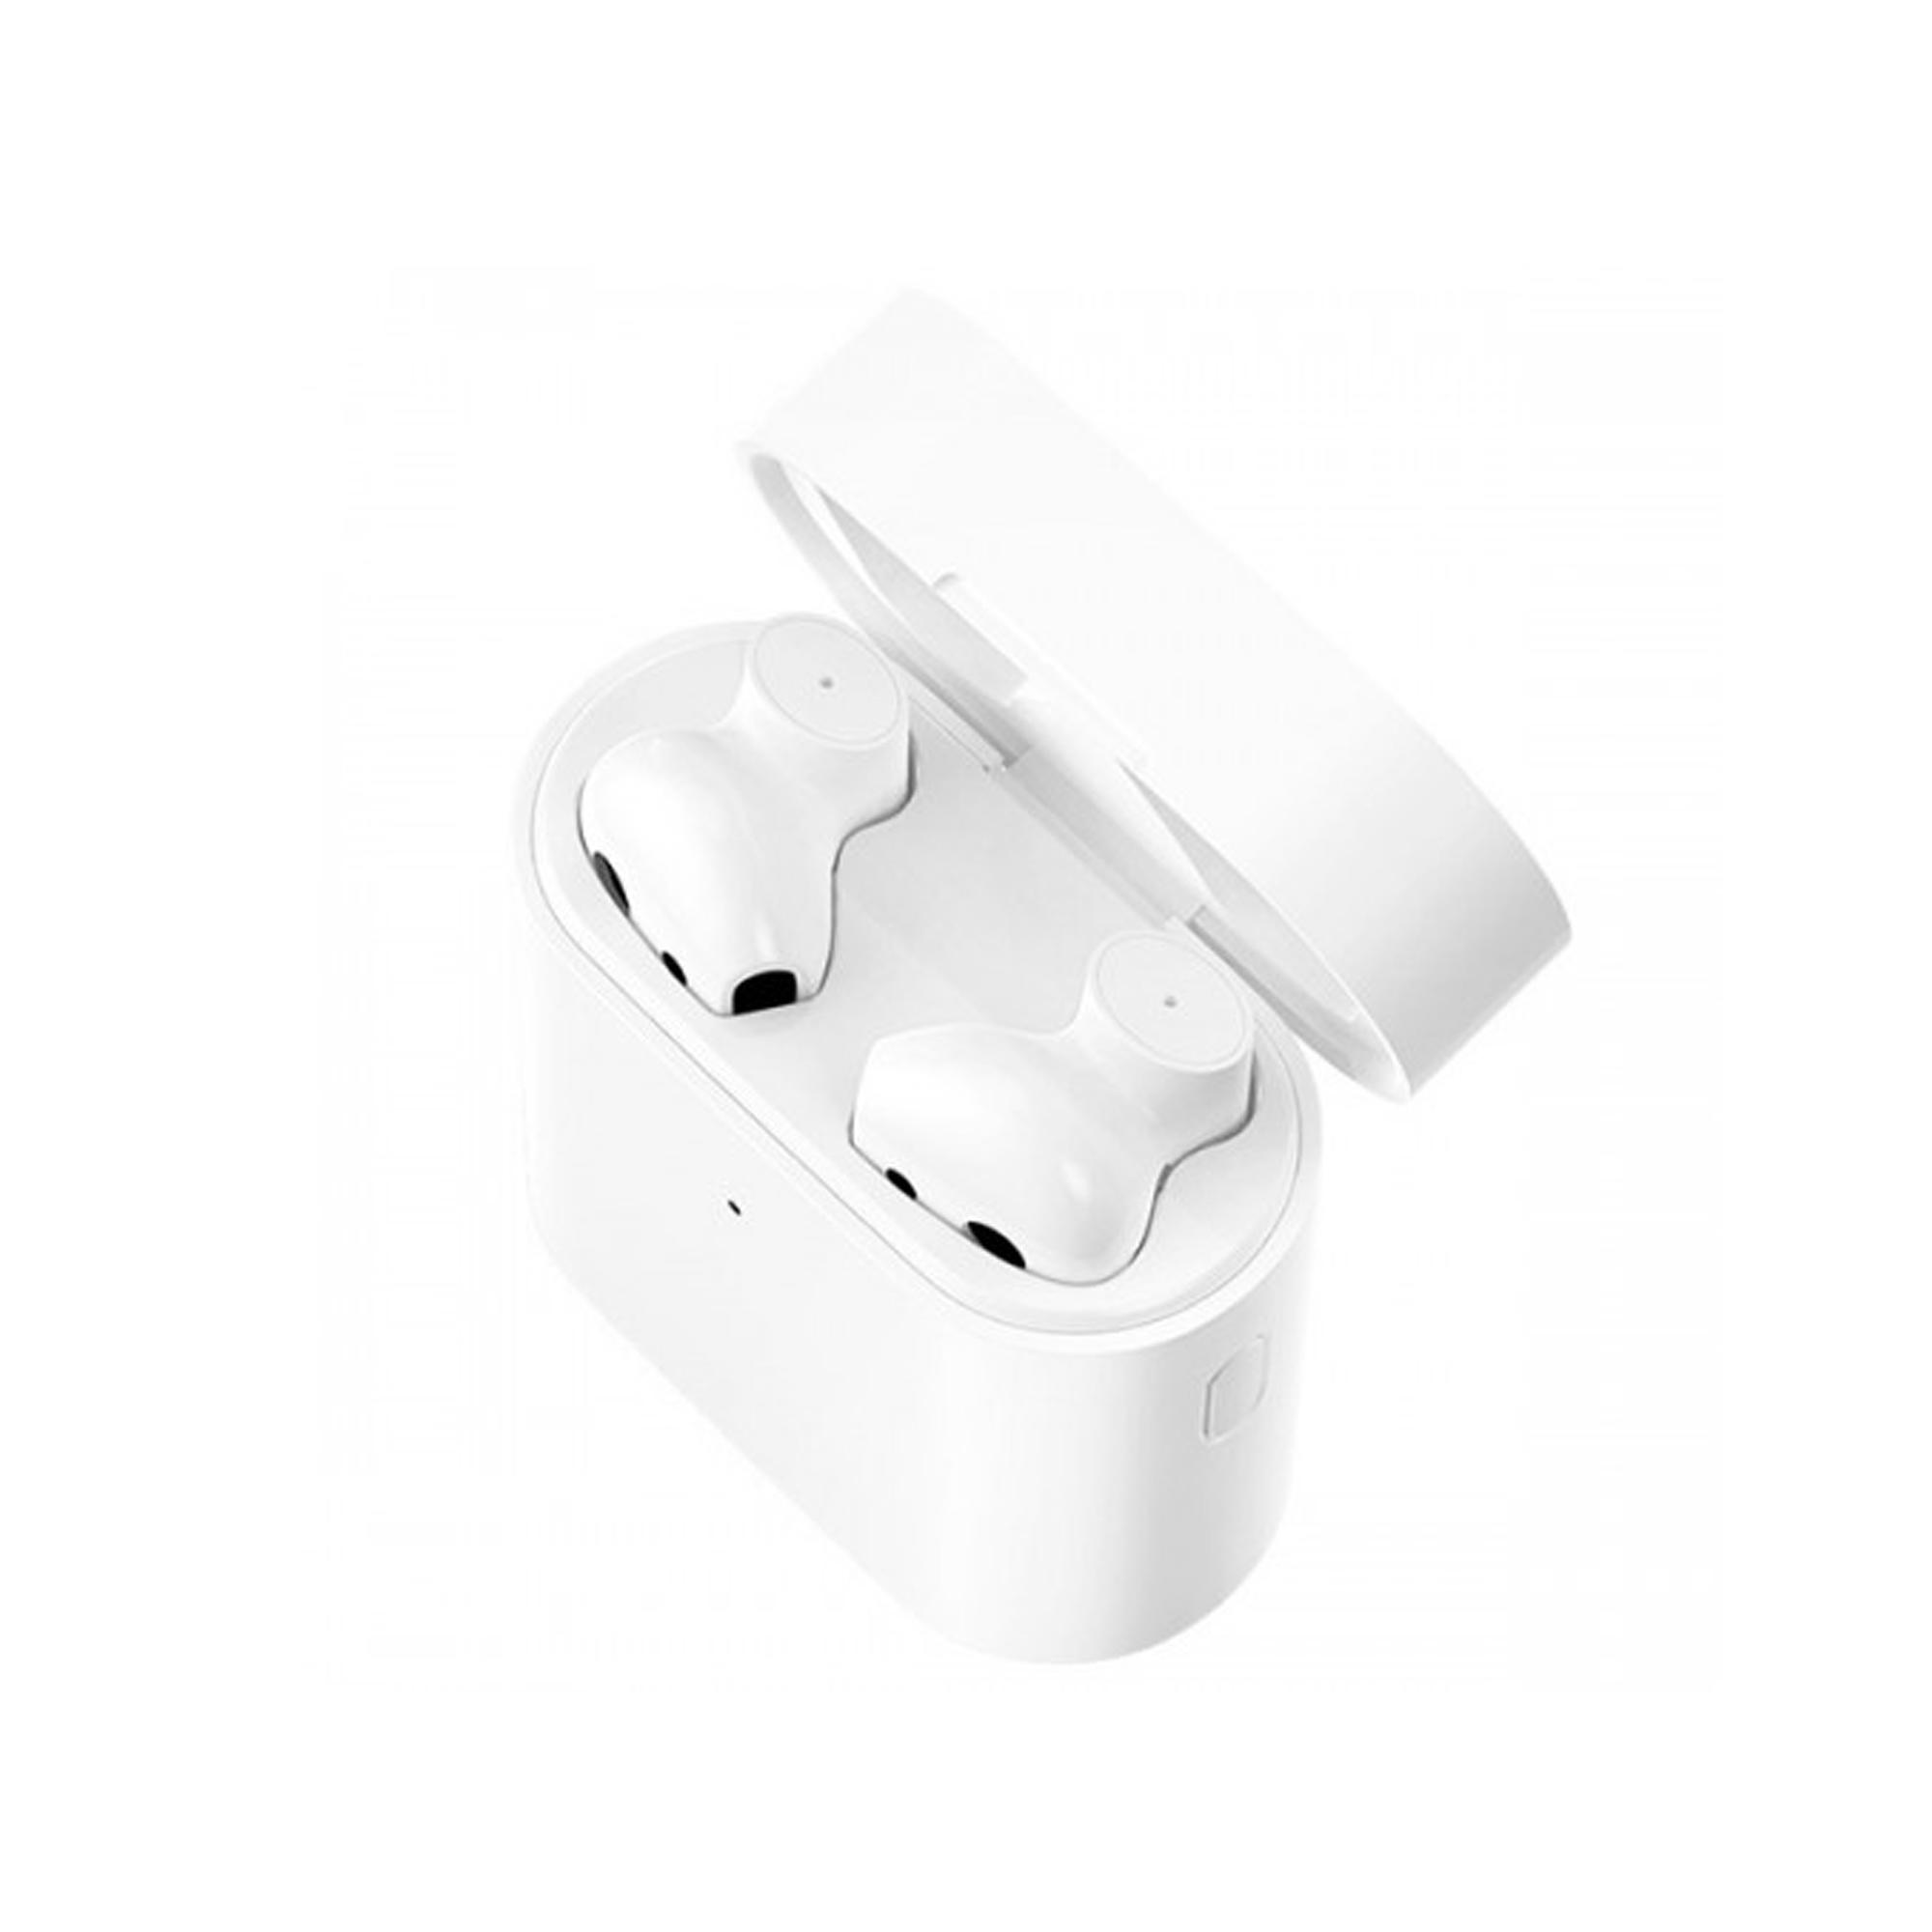 Xiaomi True Wireless Bluetooth Headset Air2 – ایرفون بلوتوث شیائومی مدل Air2 TWS